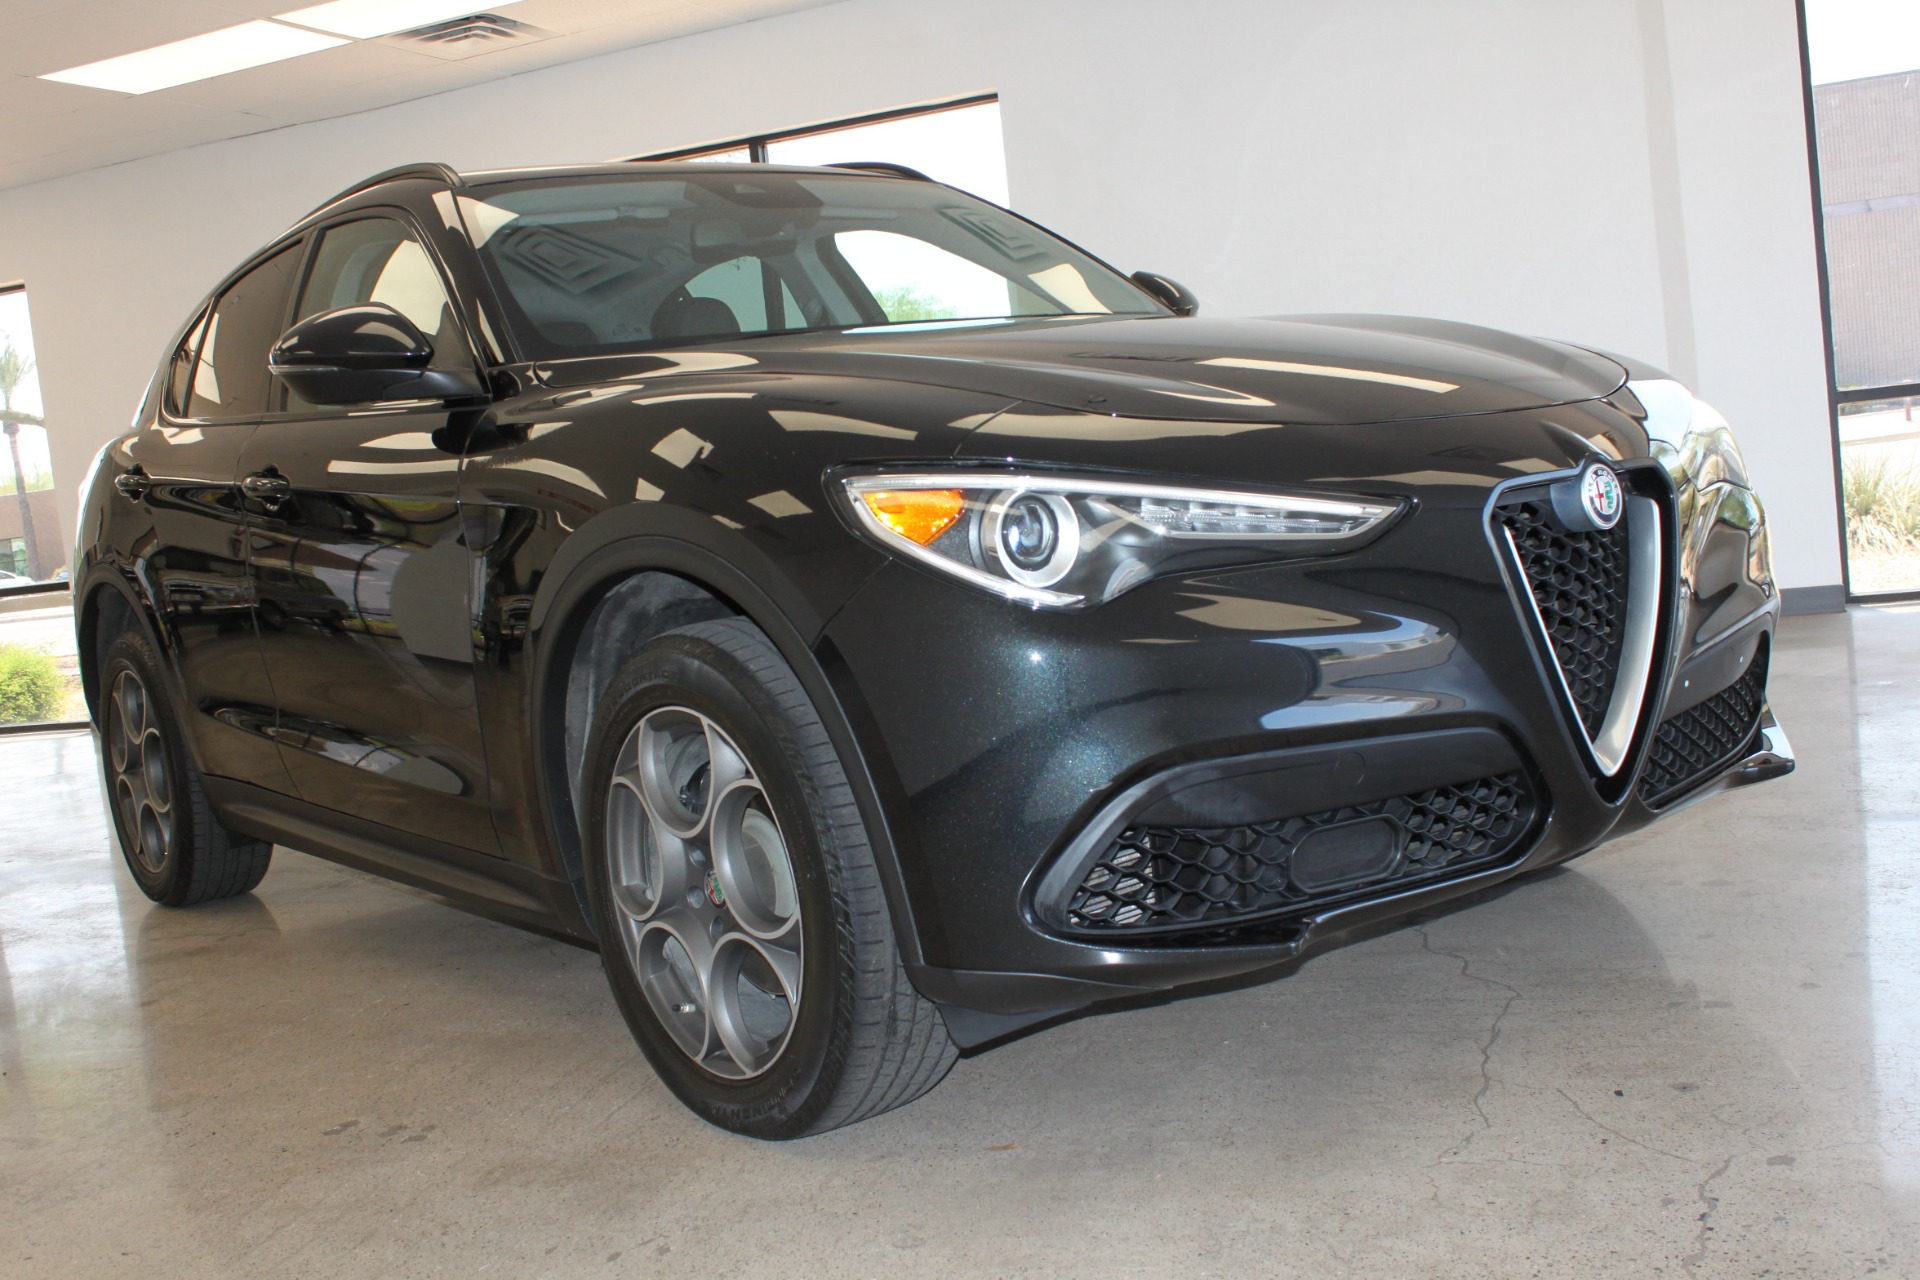 Used-2018-Alfa-Romeo-Stelvio-Sport-AWD-Mercedes-Benz